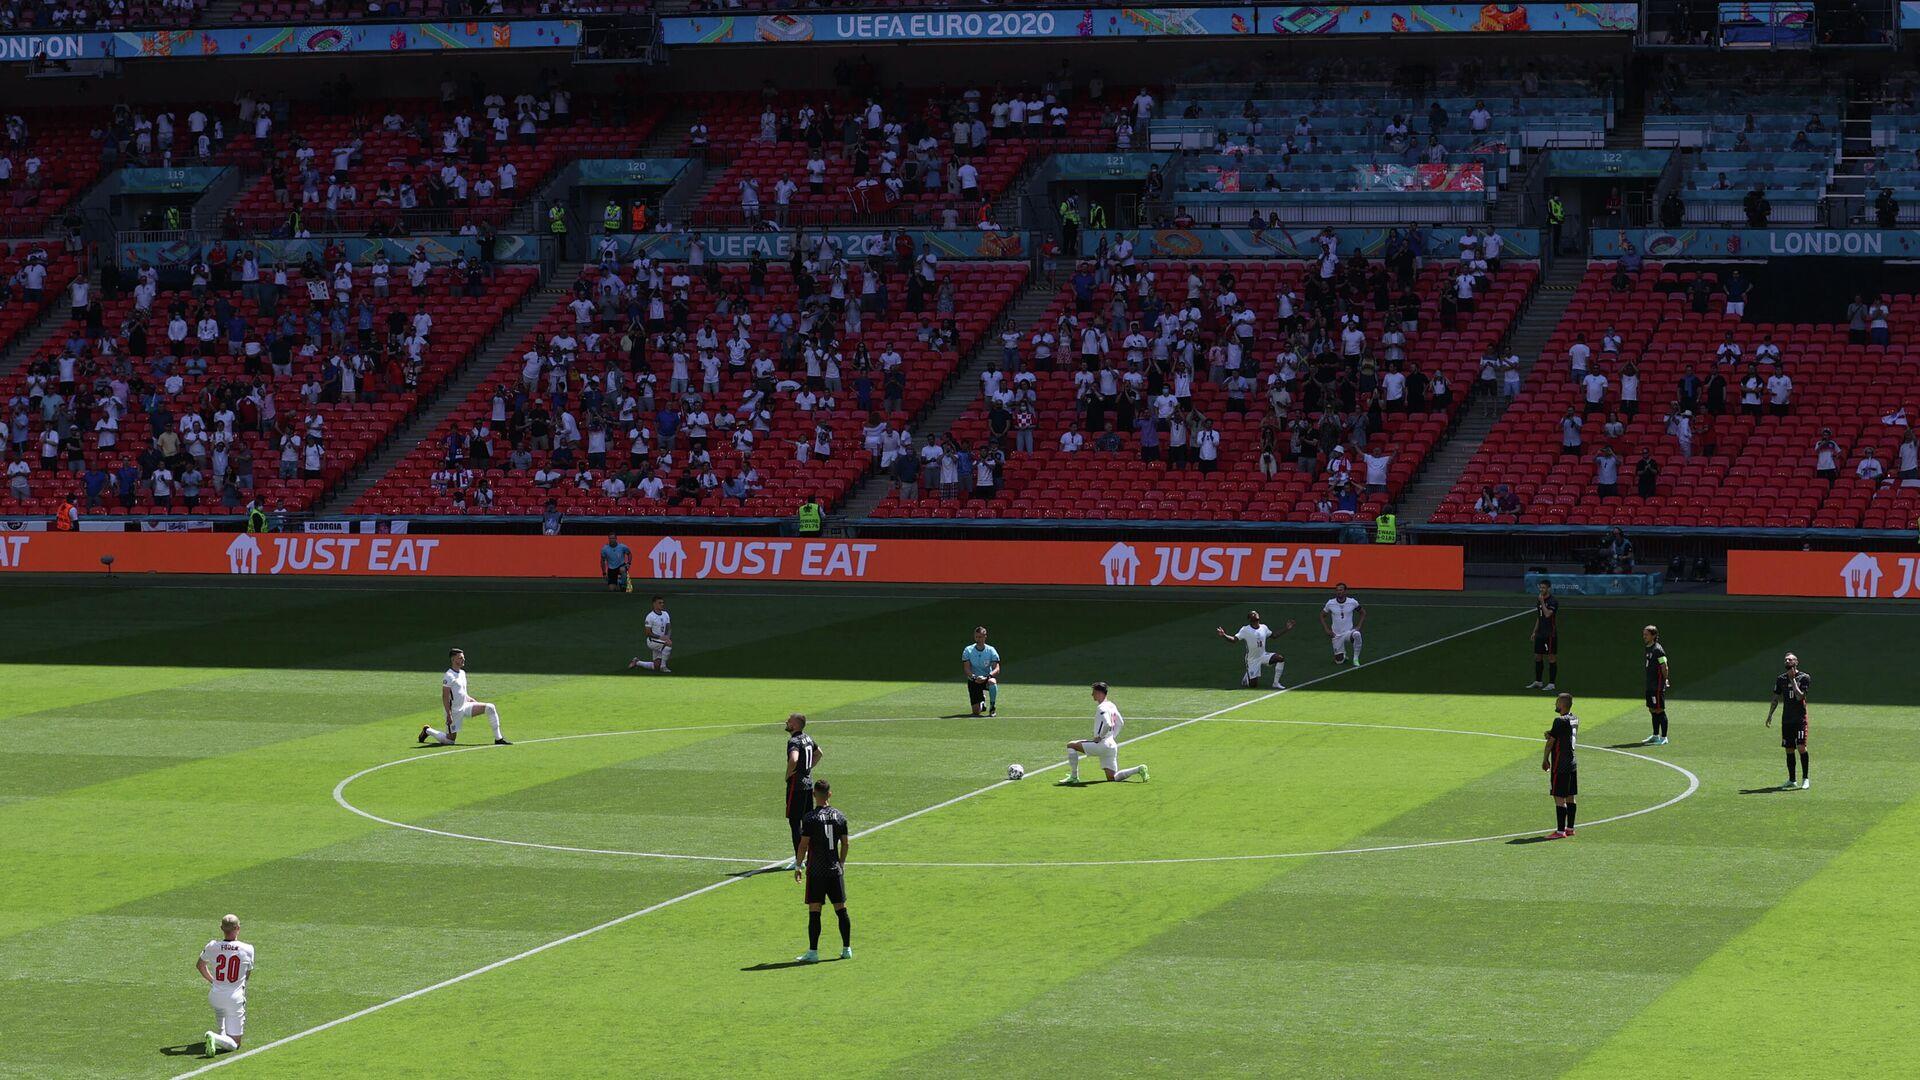 Футболисты сборной Англии преклонили колено перед началом матча ЕВРО-2020 со сборной Хорватии - РИА Новости, 1920, 13.06.2021